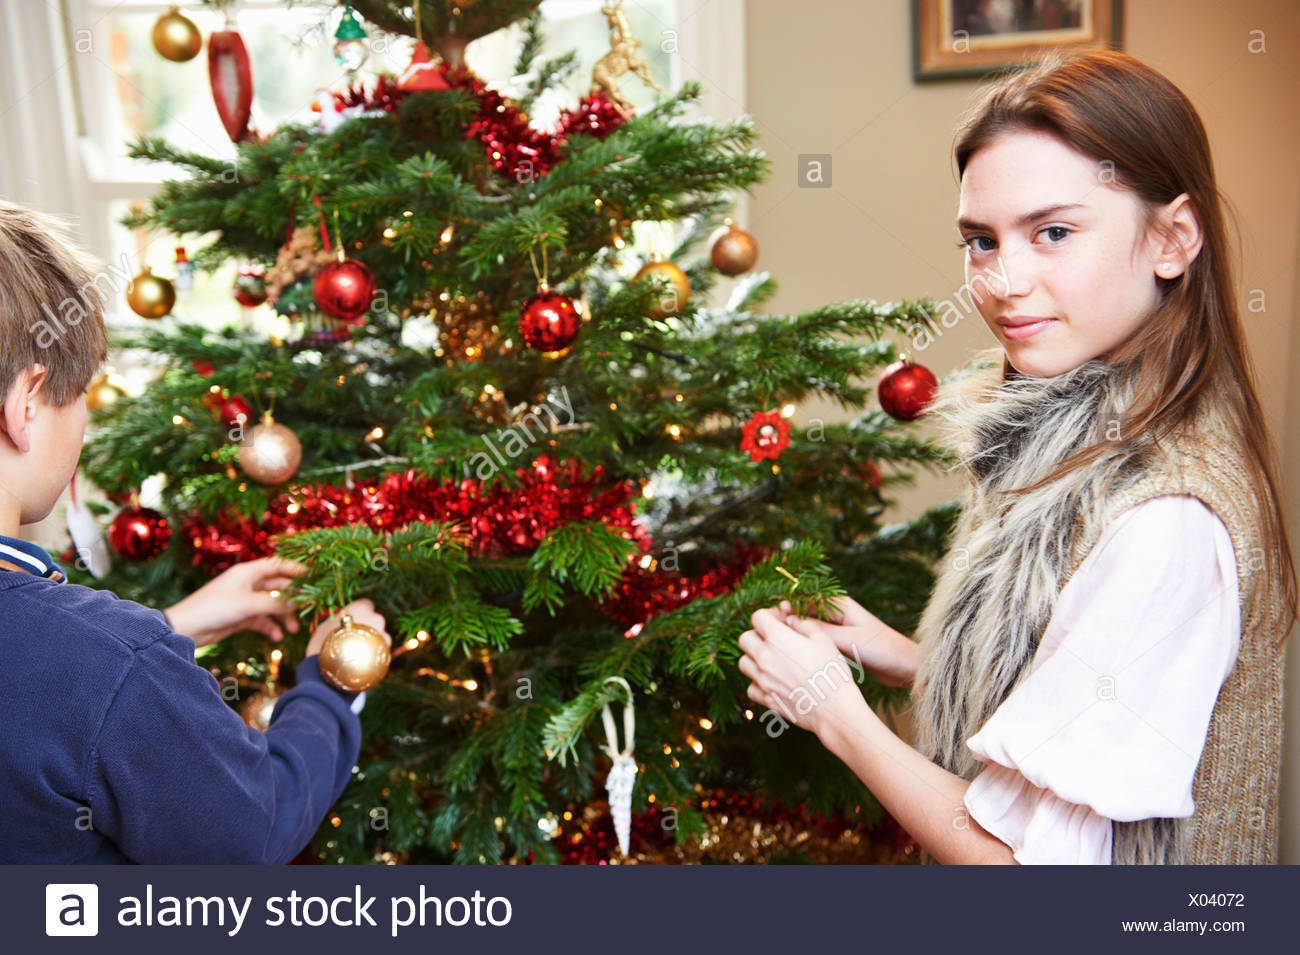 Children decorating Christmas tree - Stock Image